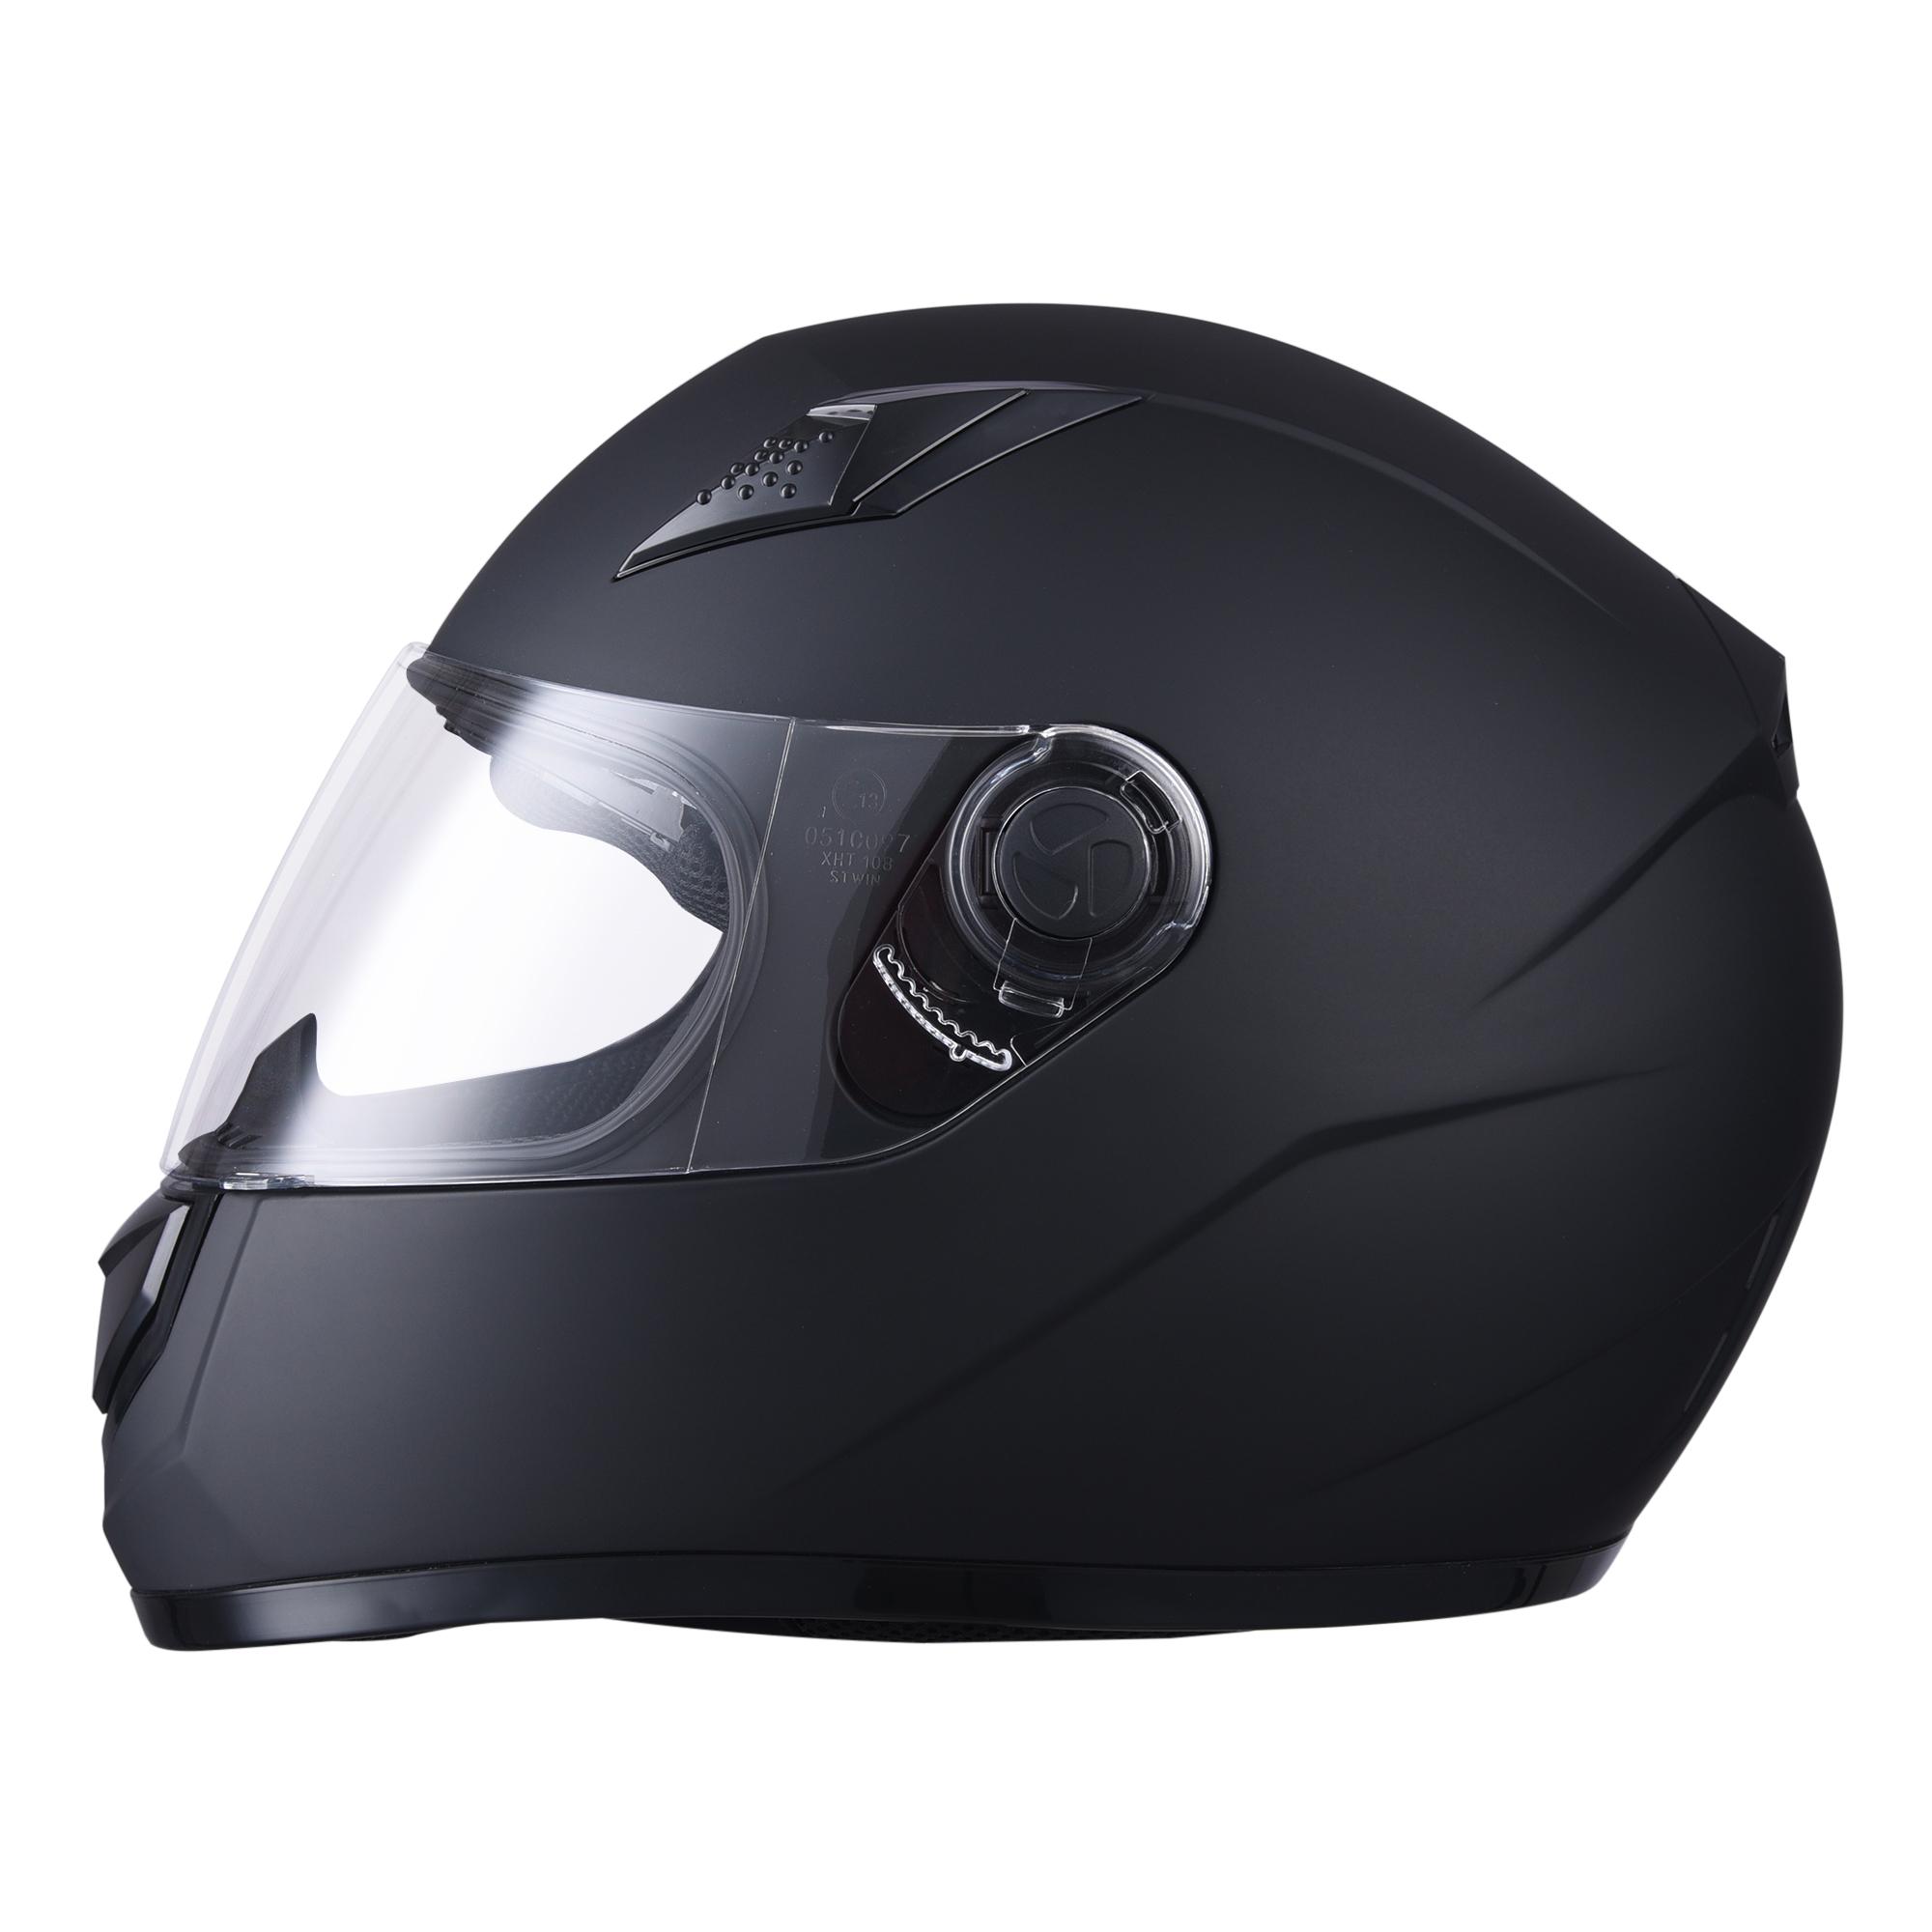 miniature 63 - AHR K12 Full Face Motorcycle Helmet DOT Air Vents Clear Visor Racing S M L XL